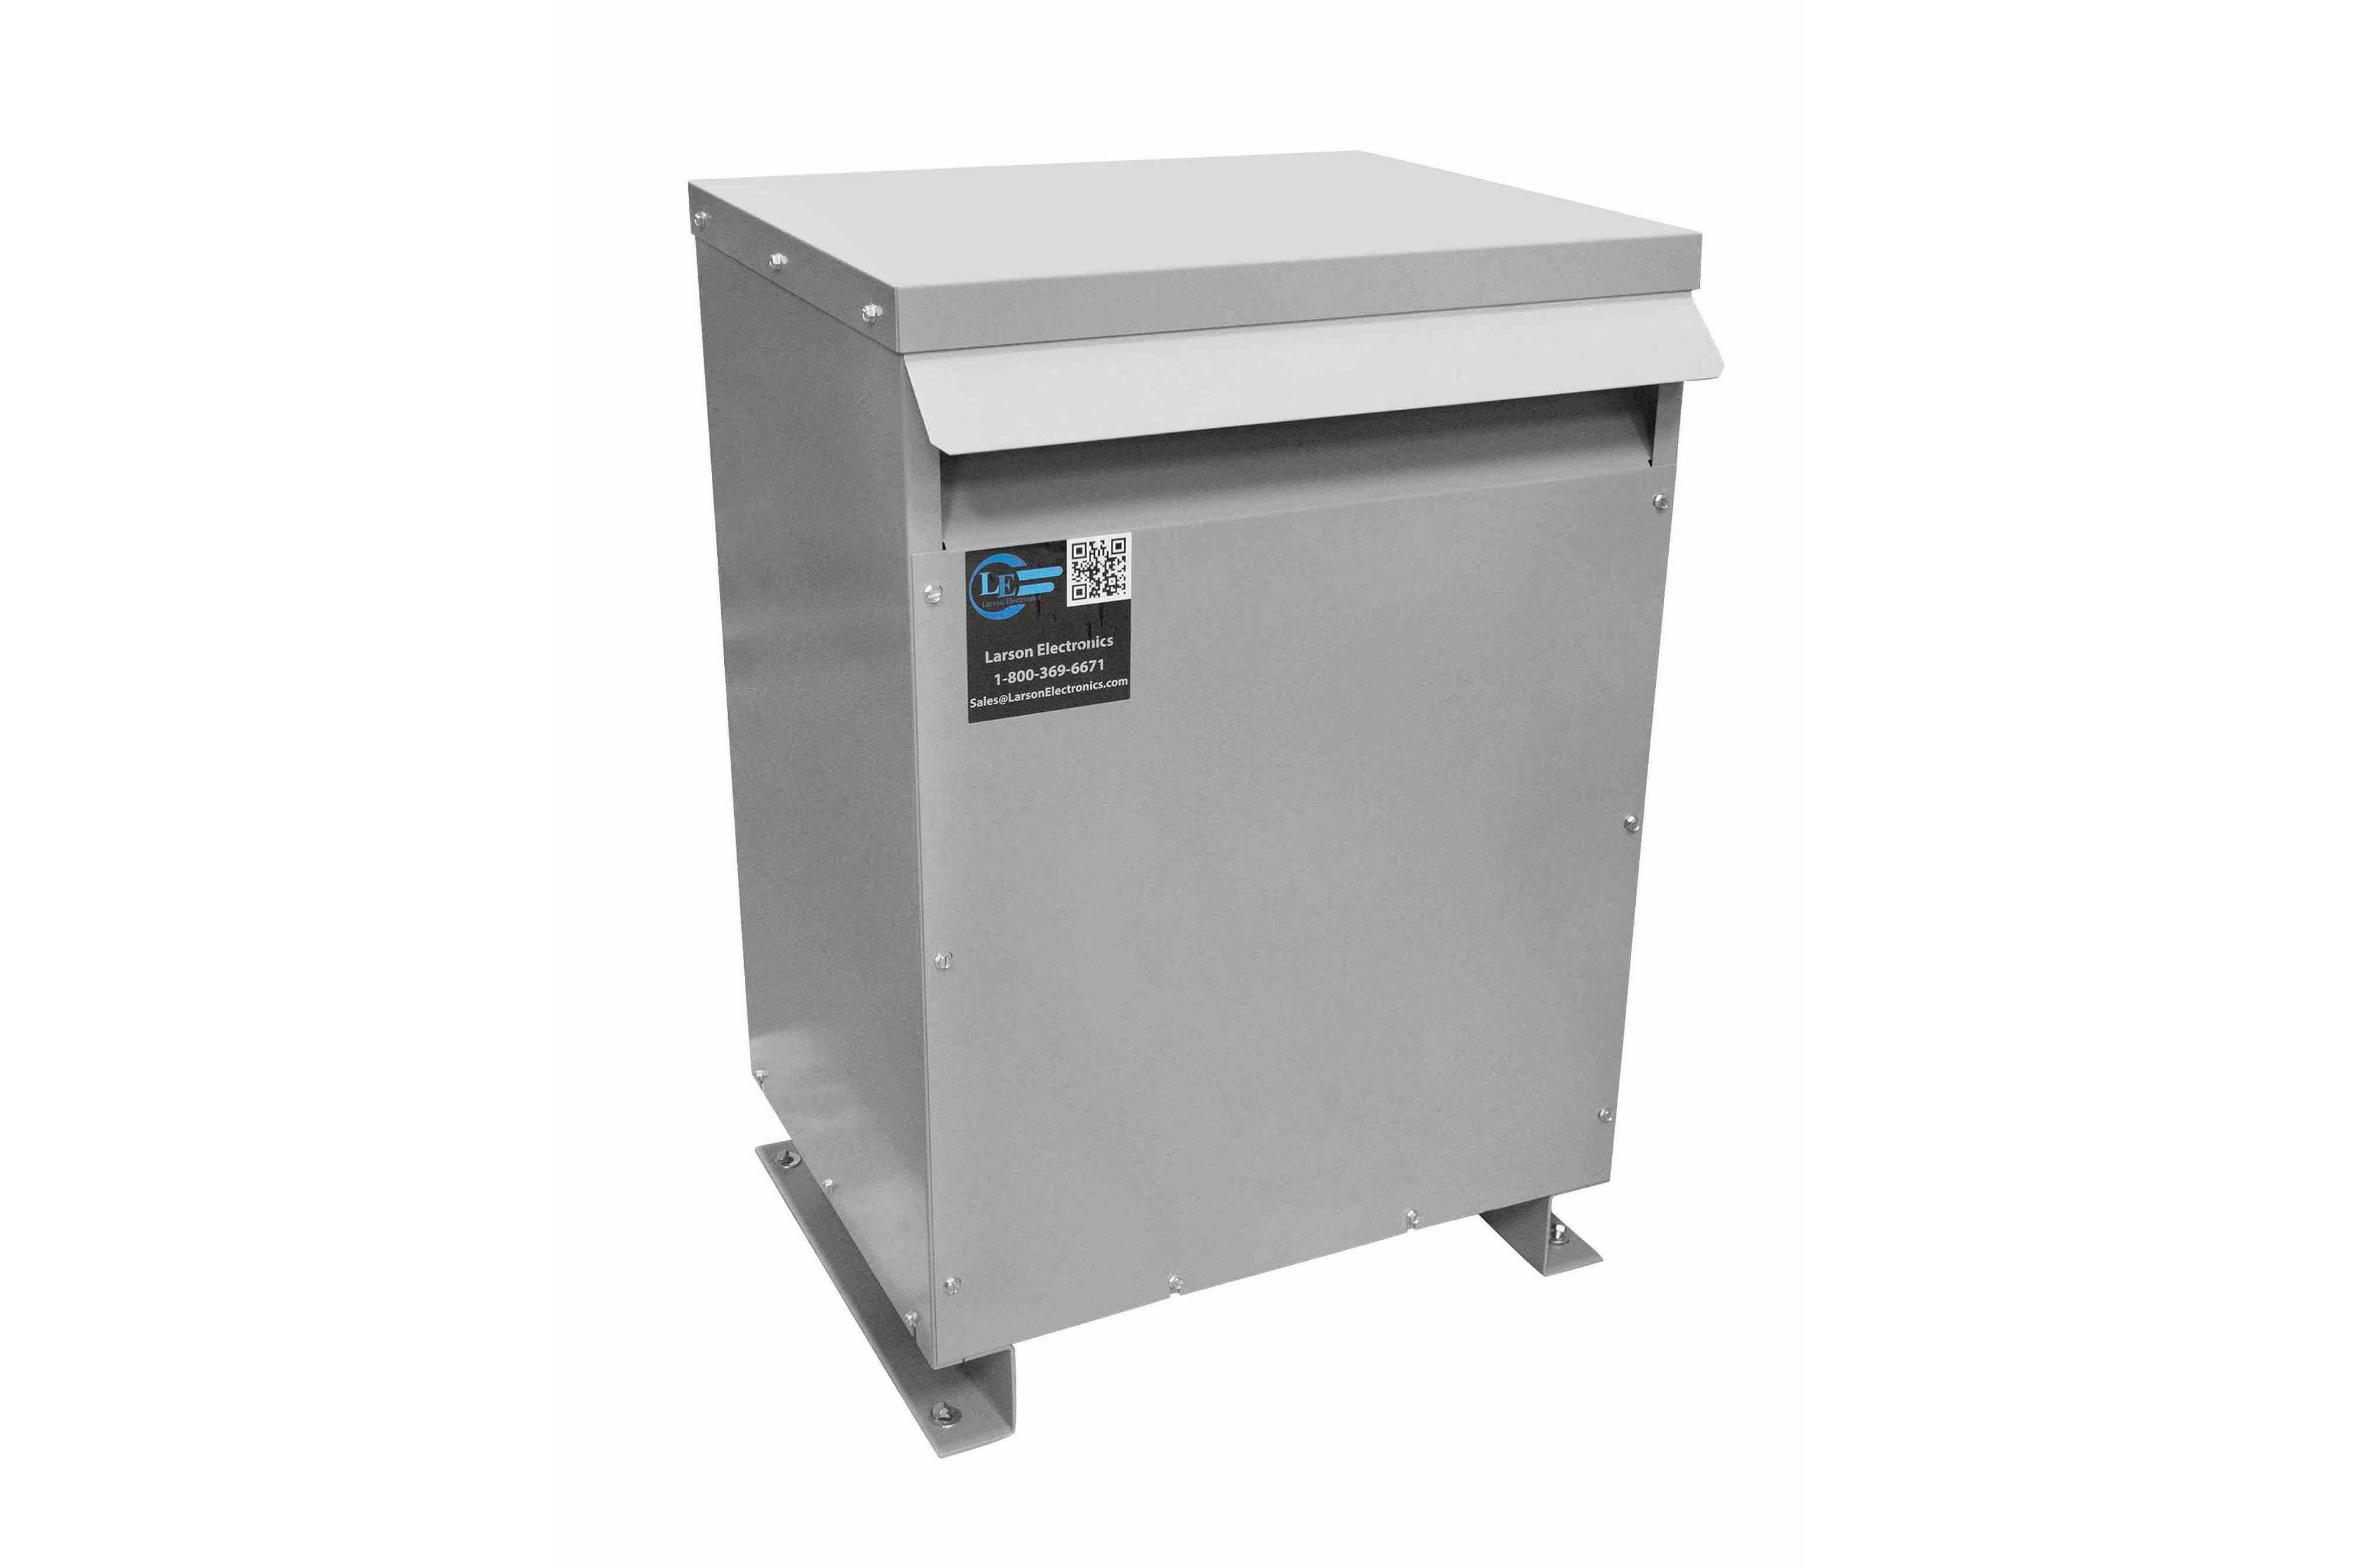 47.5 kVA 3PH Isolation Transformer, 400V Wye Primary, 240V/120 Delta Secondary, N3R, Ventilated, 60 Hz